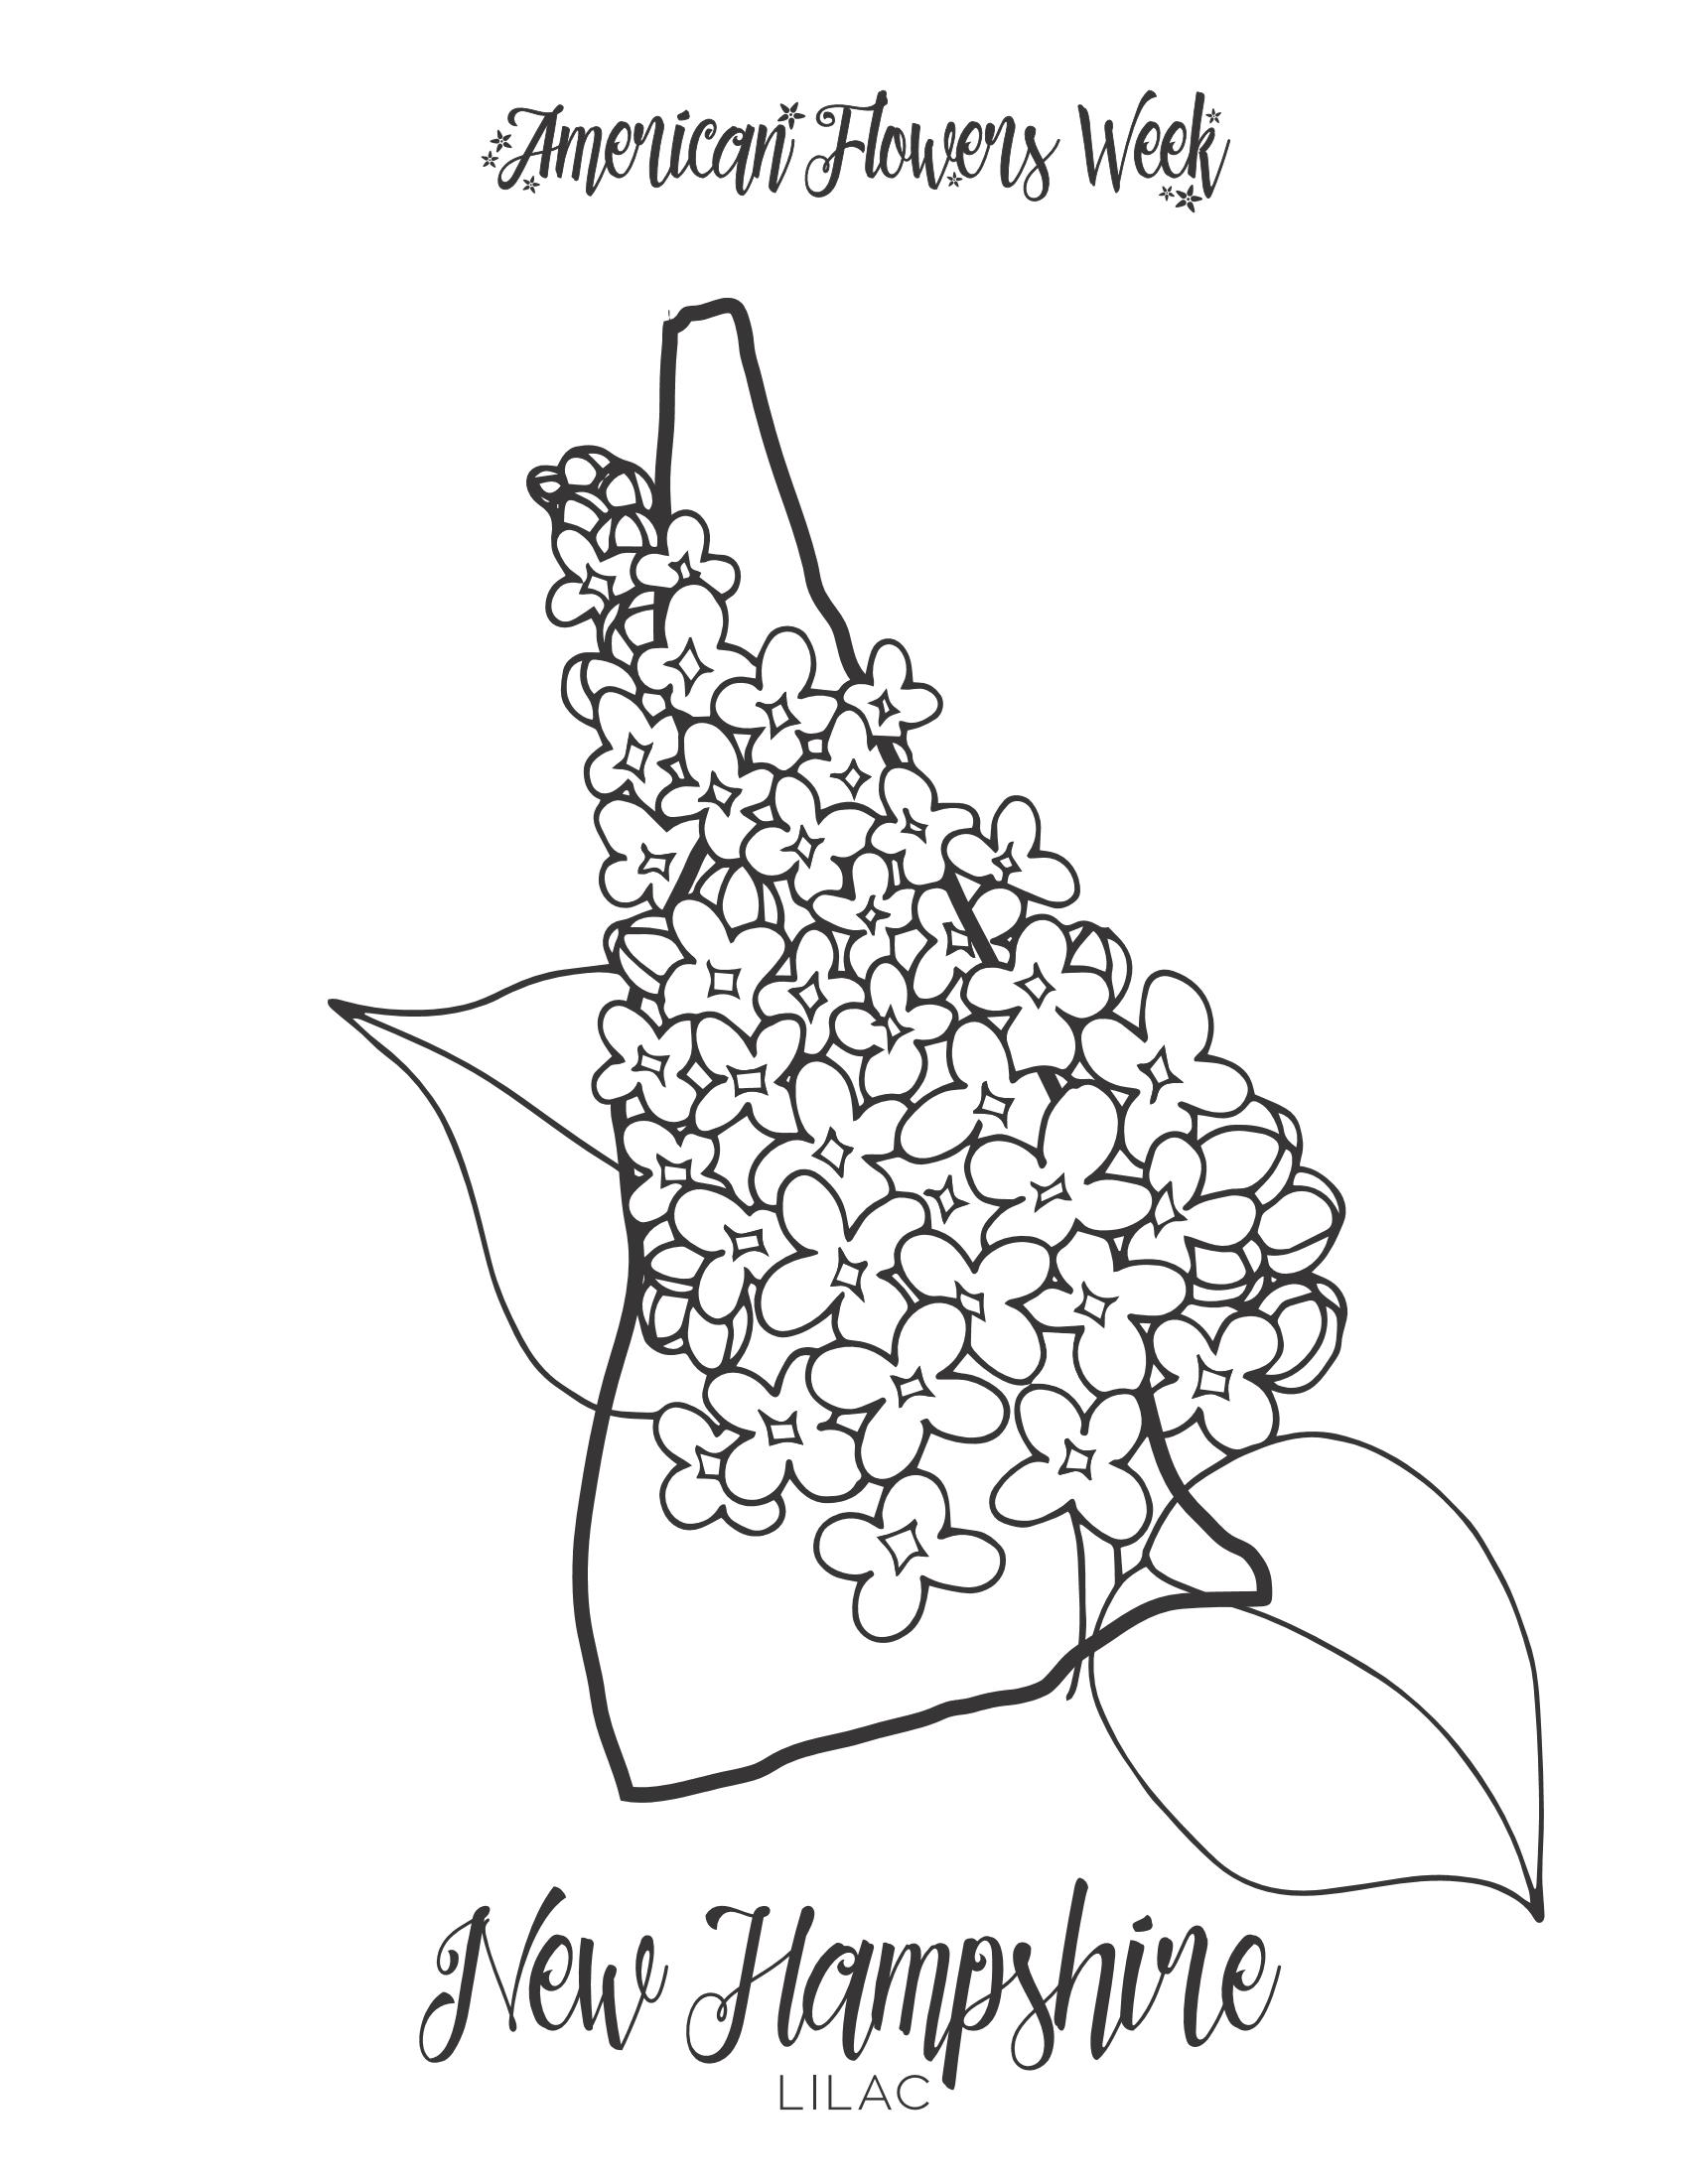 50 State Flowers Free Coloring Pages American Flowers Week